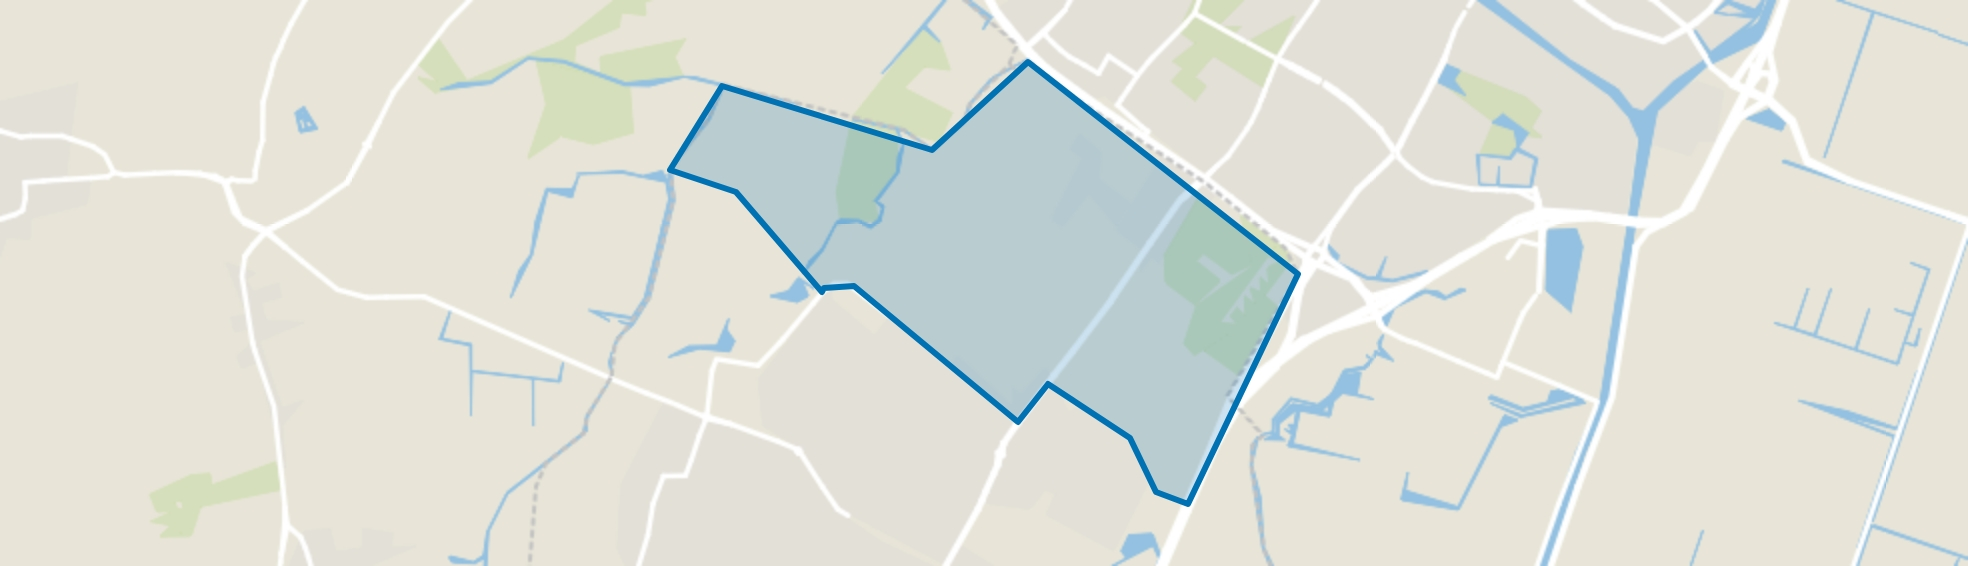 Blockhovepark, Heiloo map